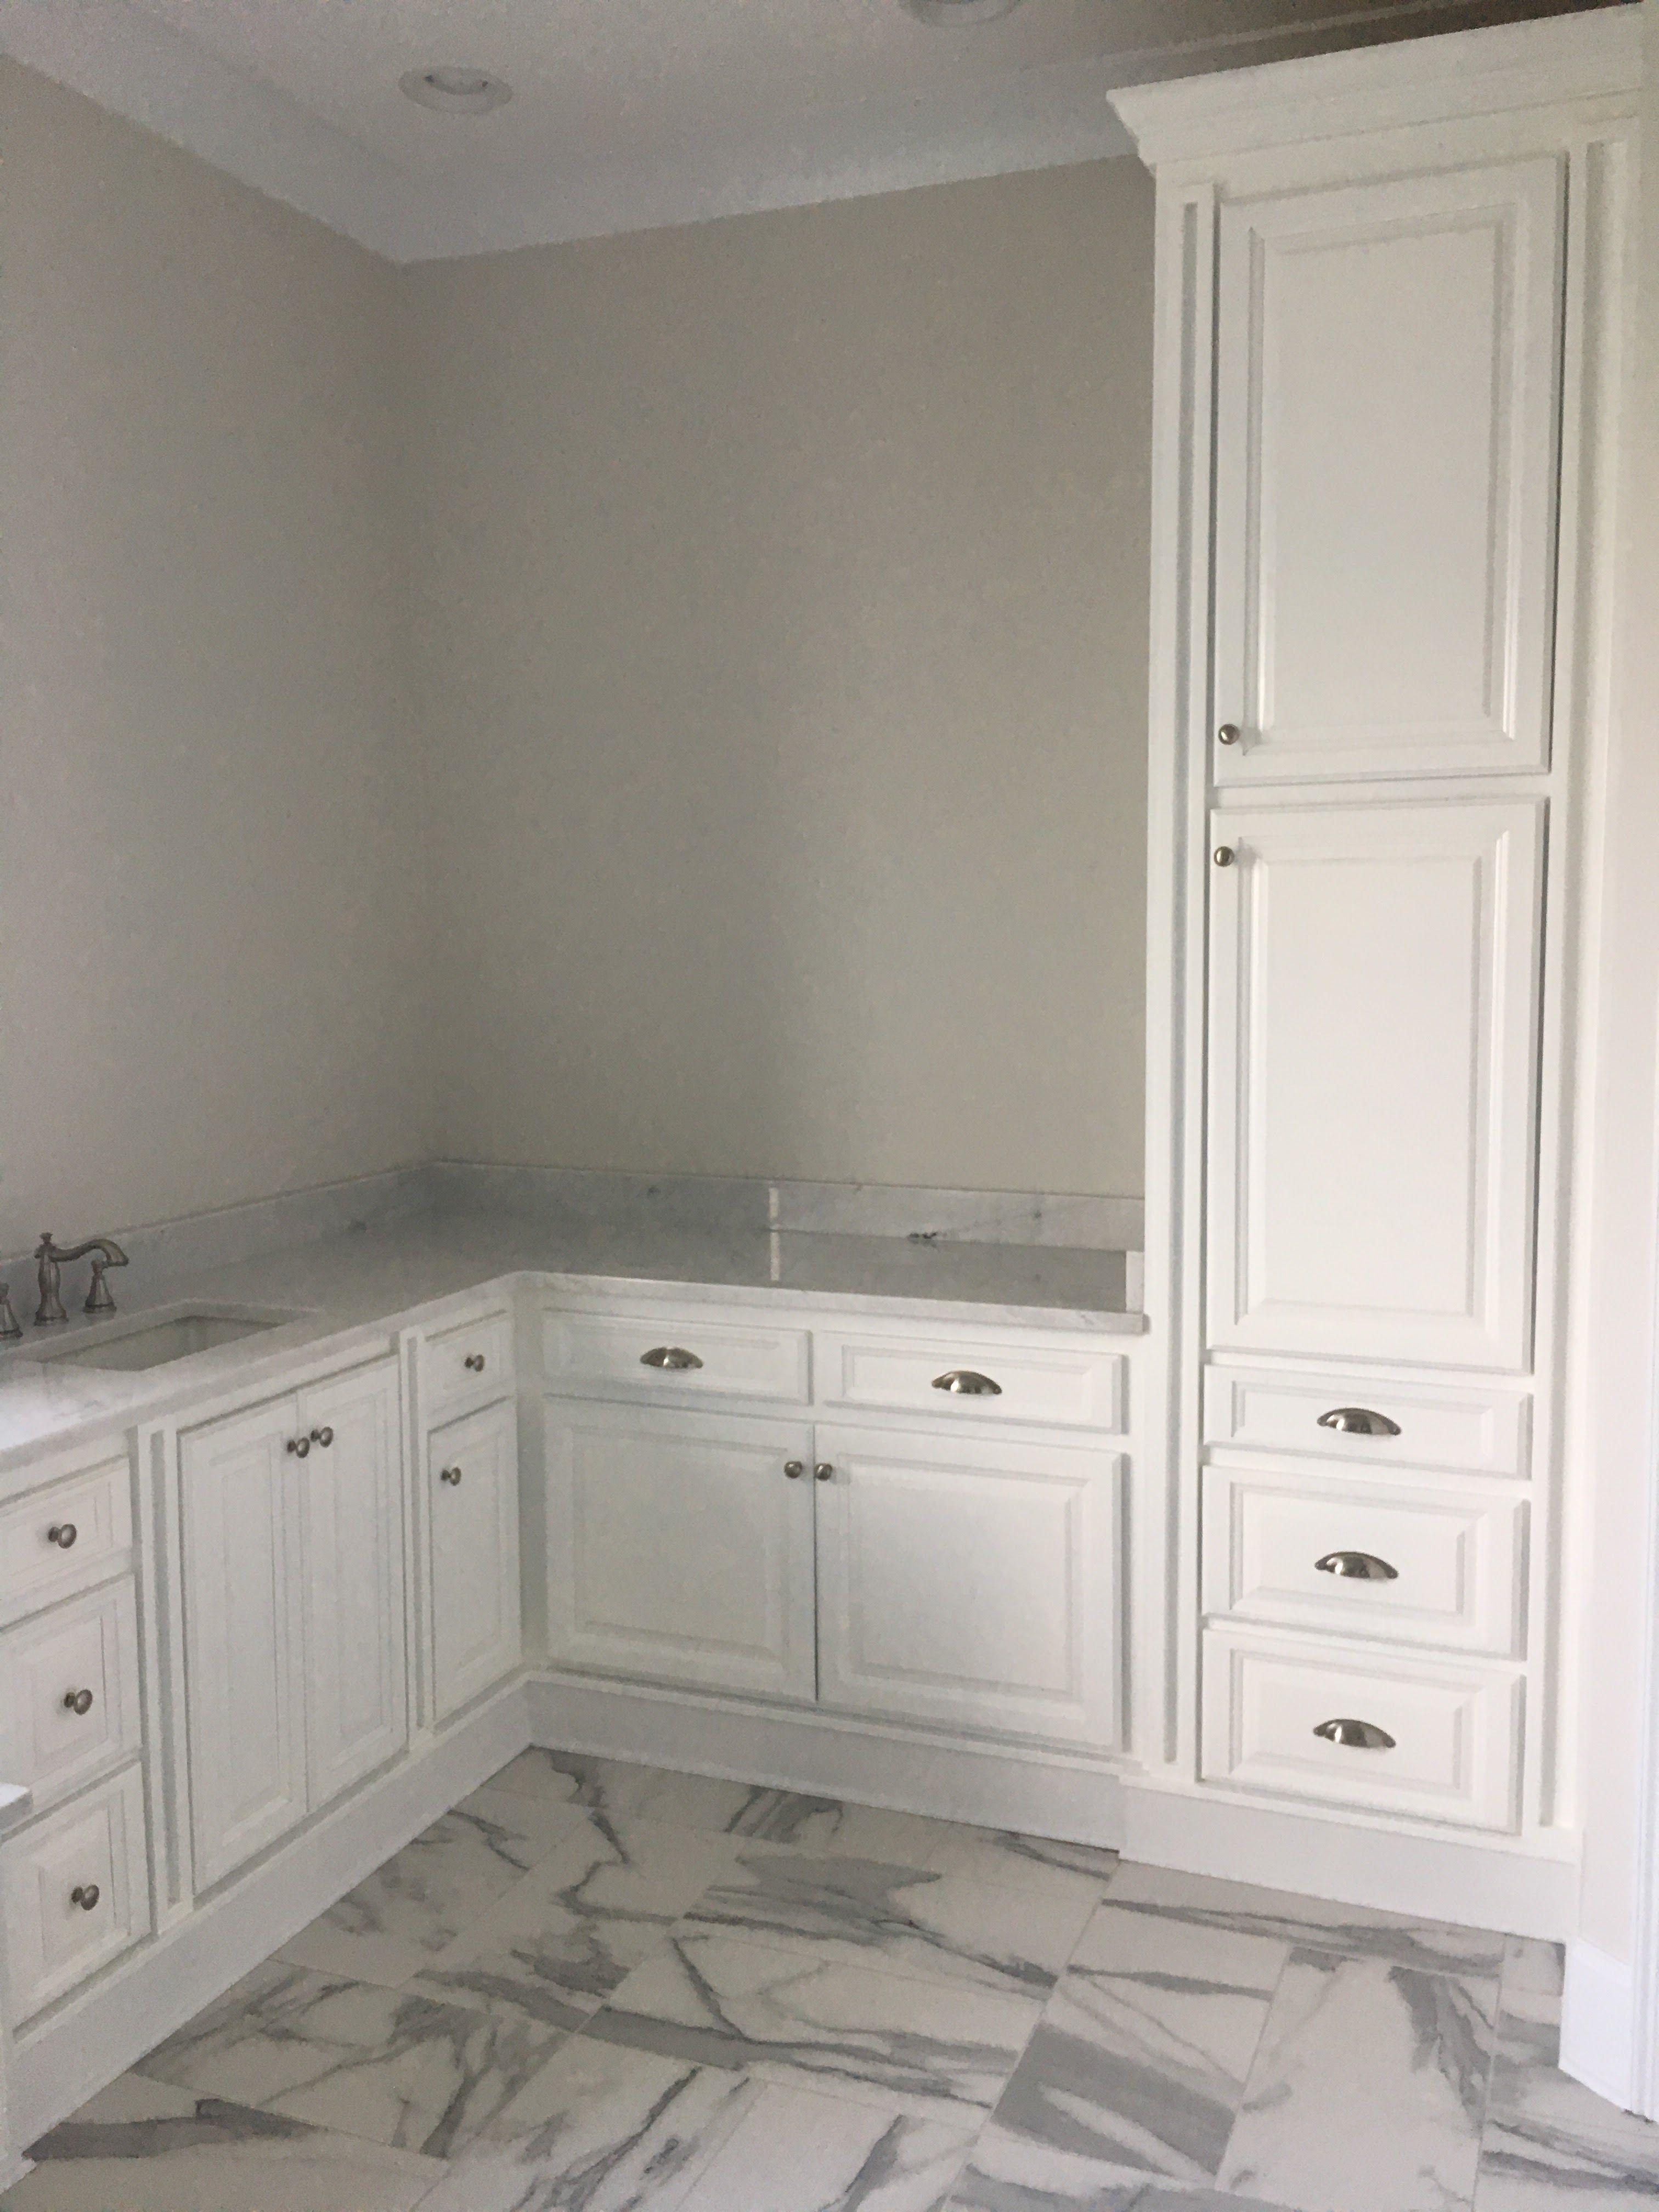 Tall cabinet Laundry RoomsLaundry Room